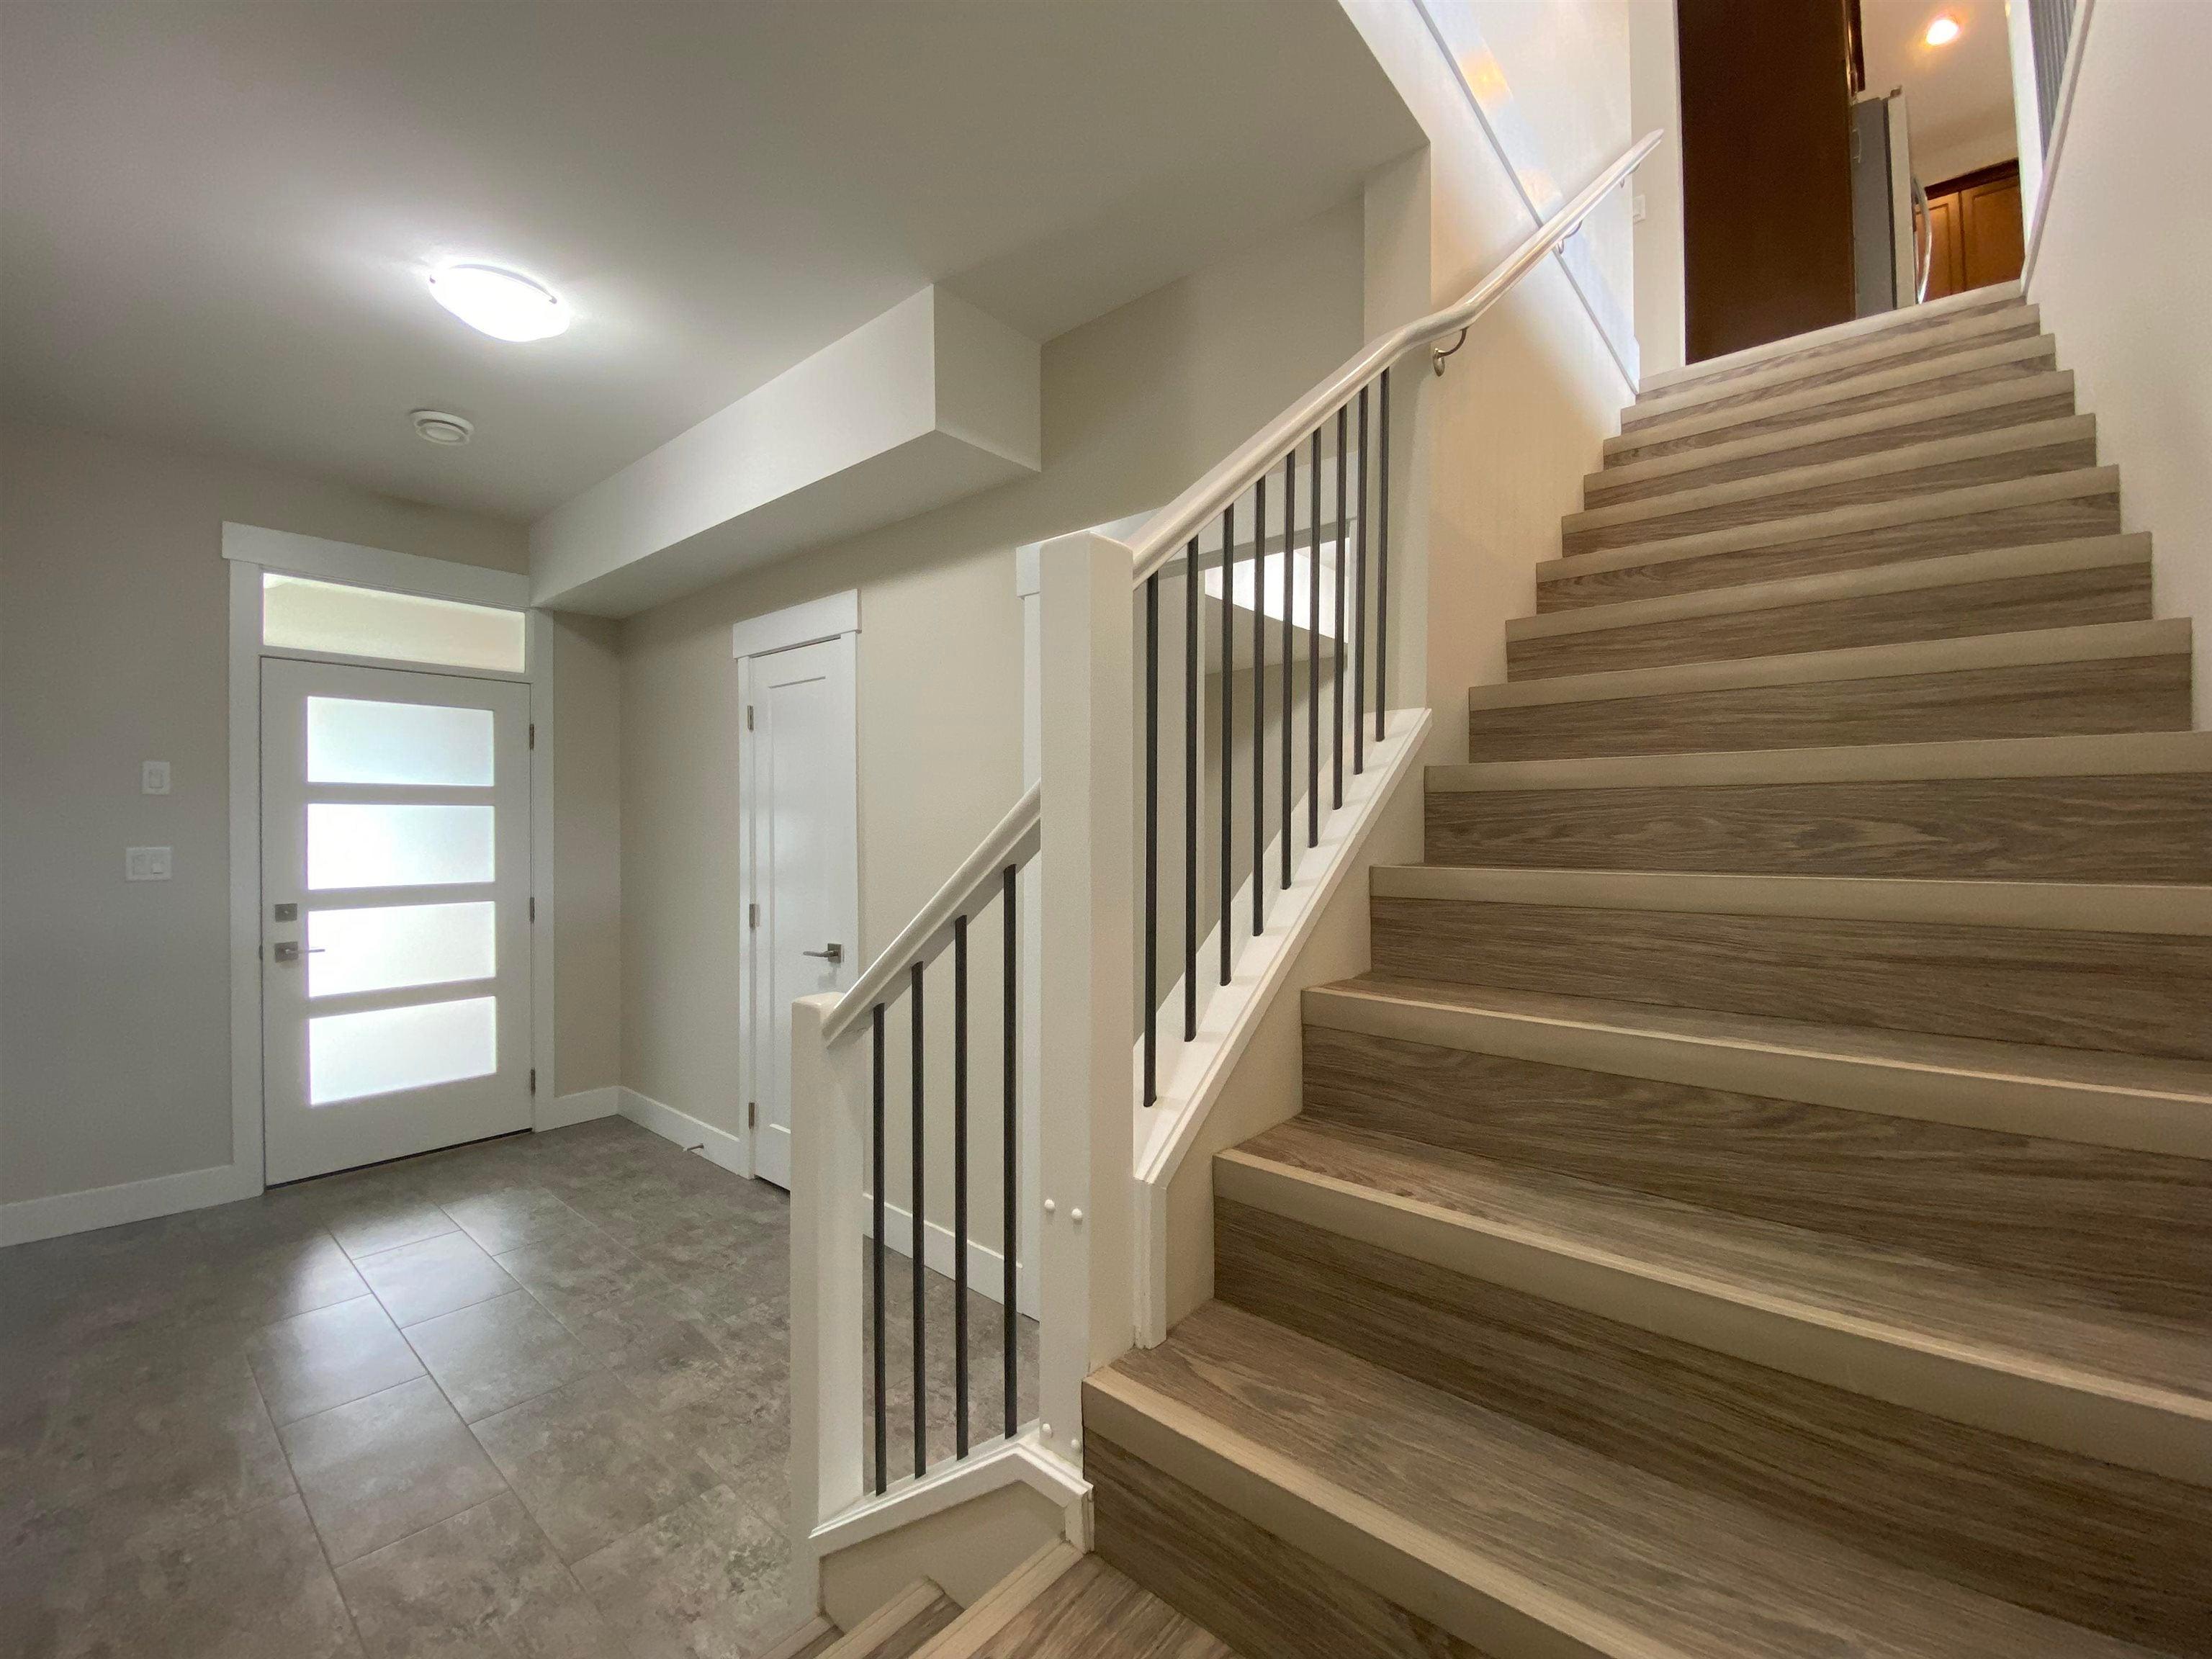 10144 KILLARNEY DRIVE - Fairfield Island House/Single Family for sale, 5 Bedrooms (R2625716) - #11